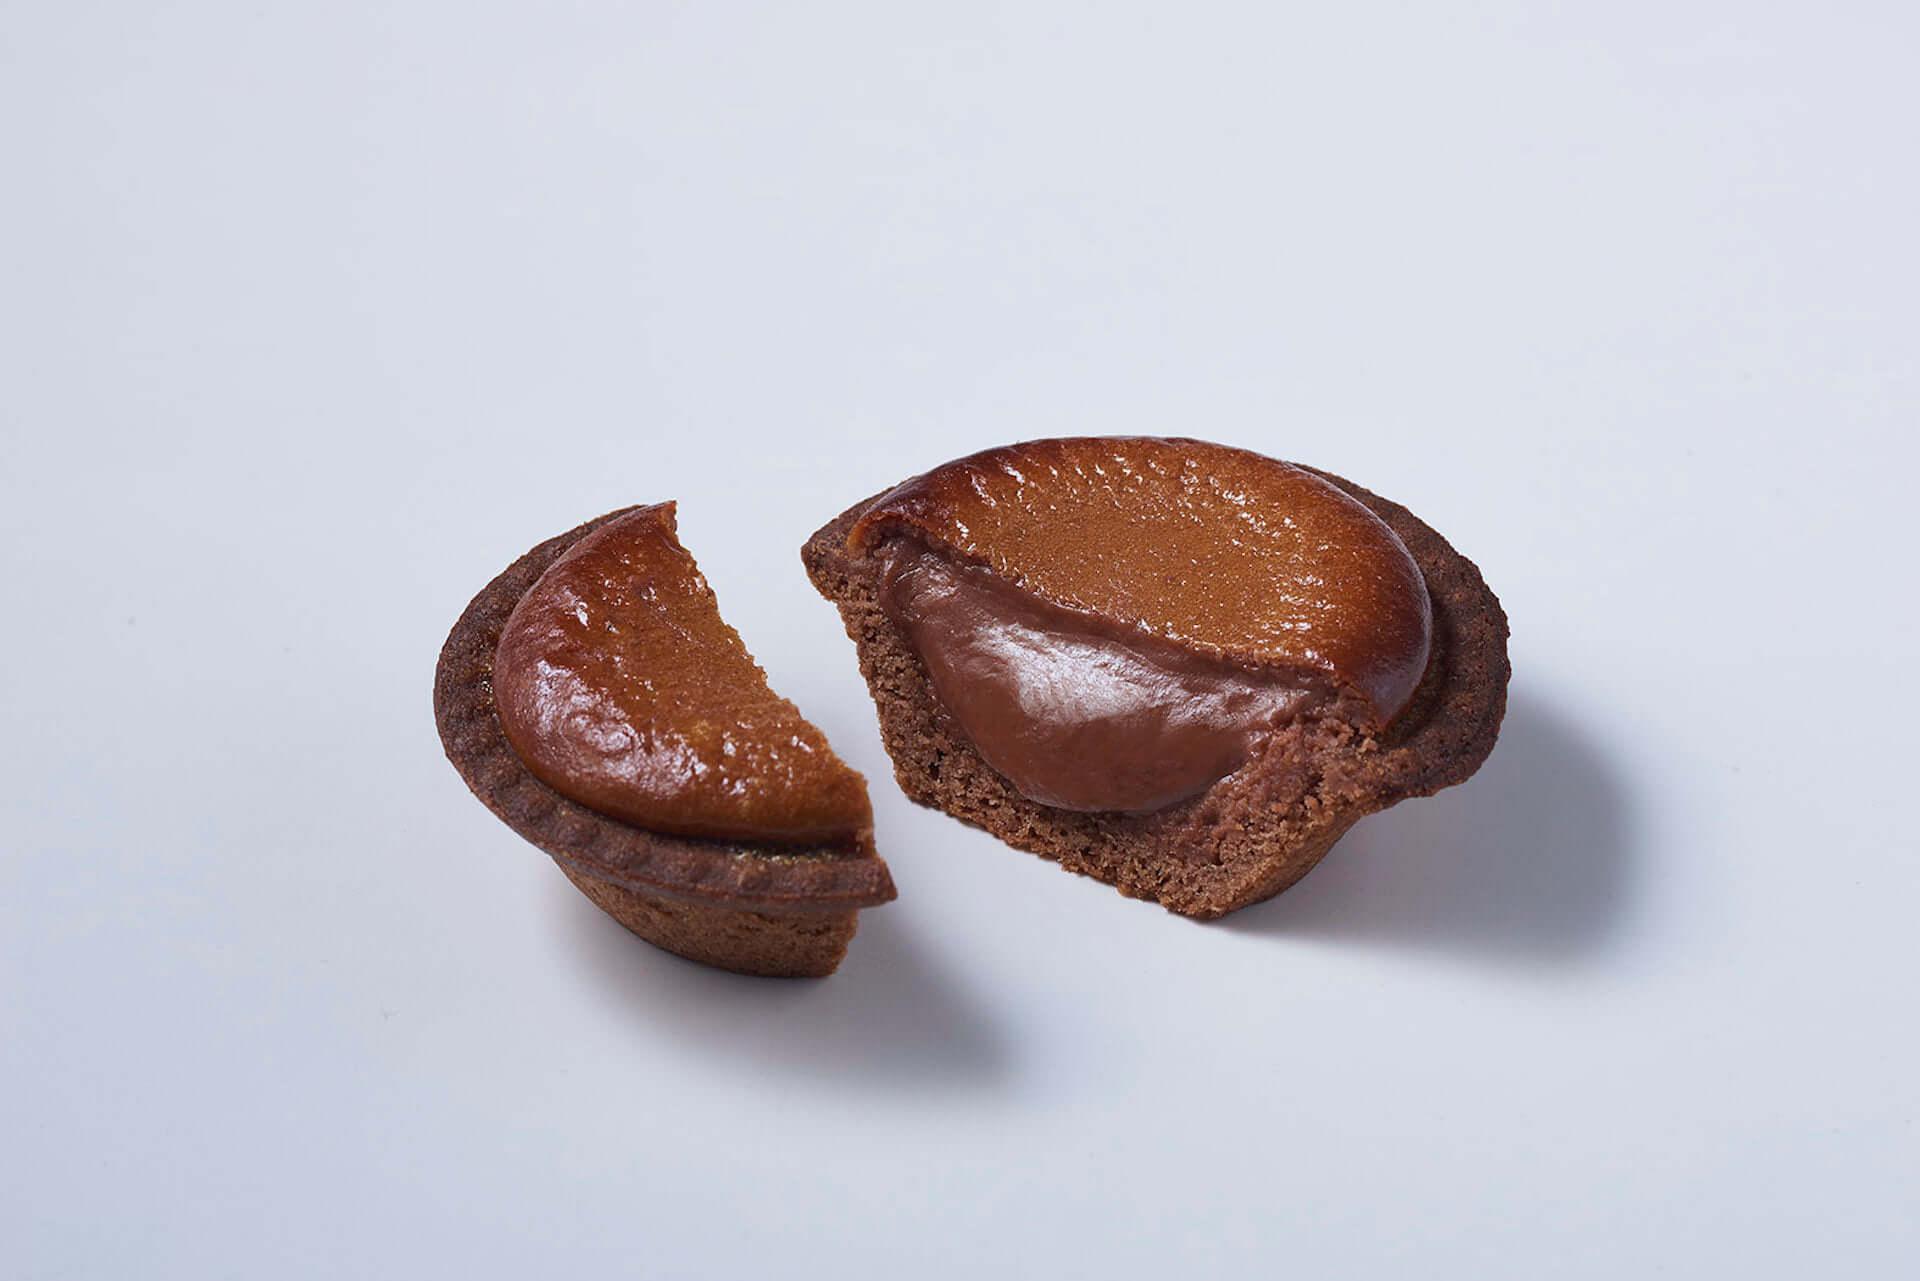 BAKE初の公式オンラインショップ「BAKE THE ONLINE」がオープン!チーズタルト10P BOXが50%OFFの特別価格に gourmet_bake_online_10-1920x1281